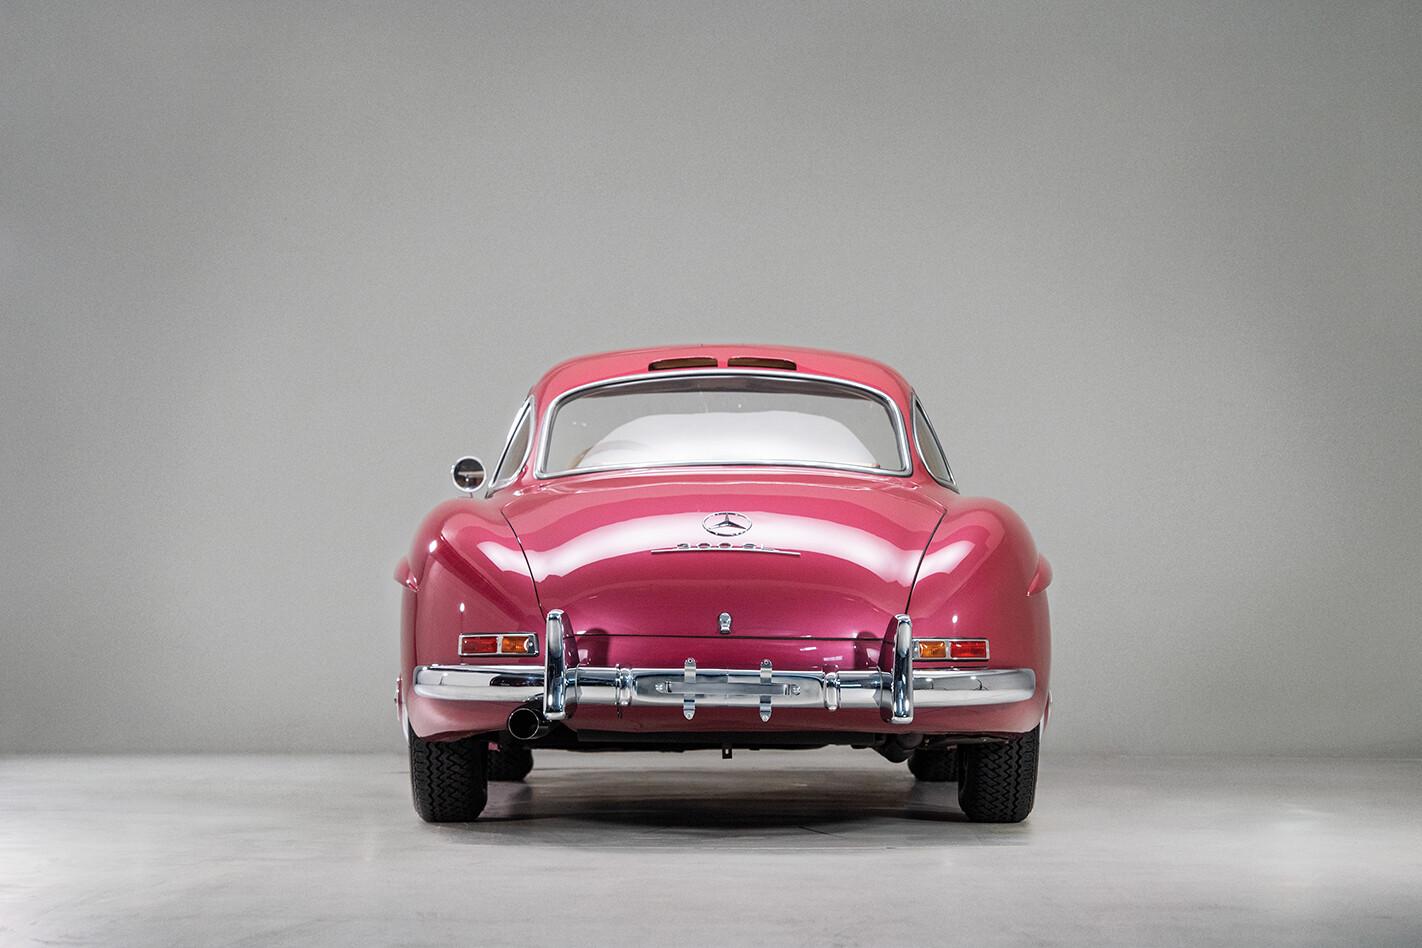 1954 Mercedes-Benz 300 SL rear